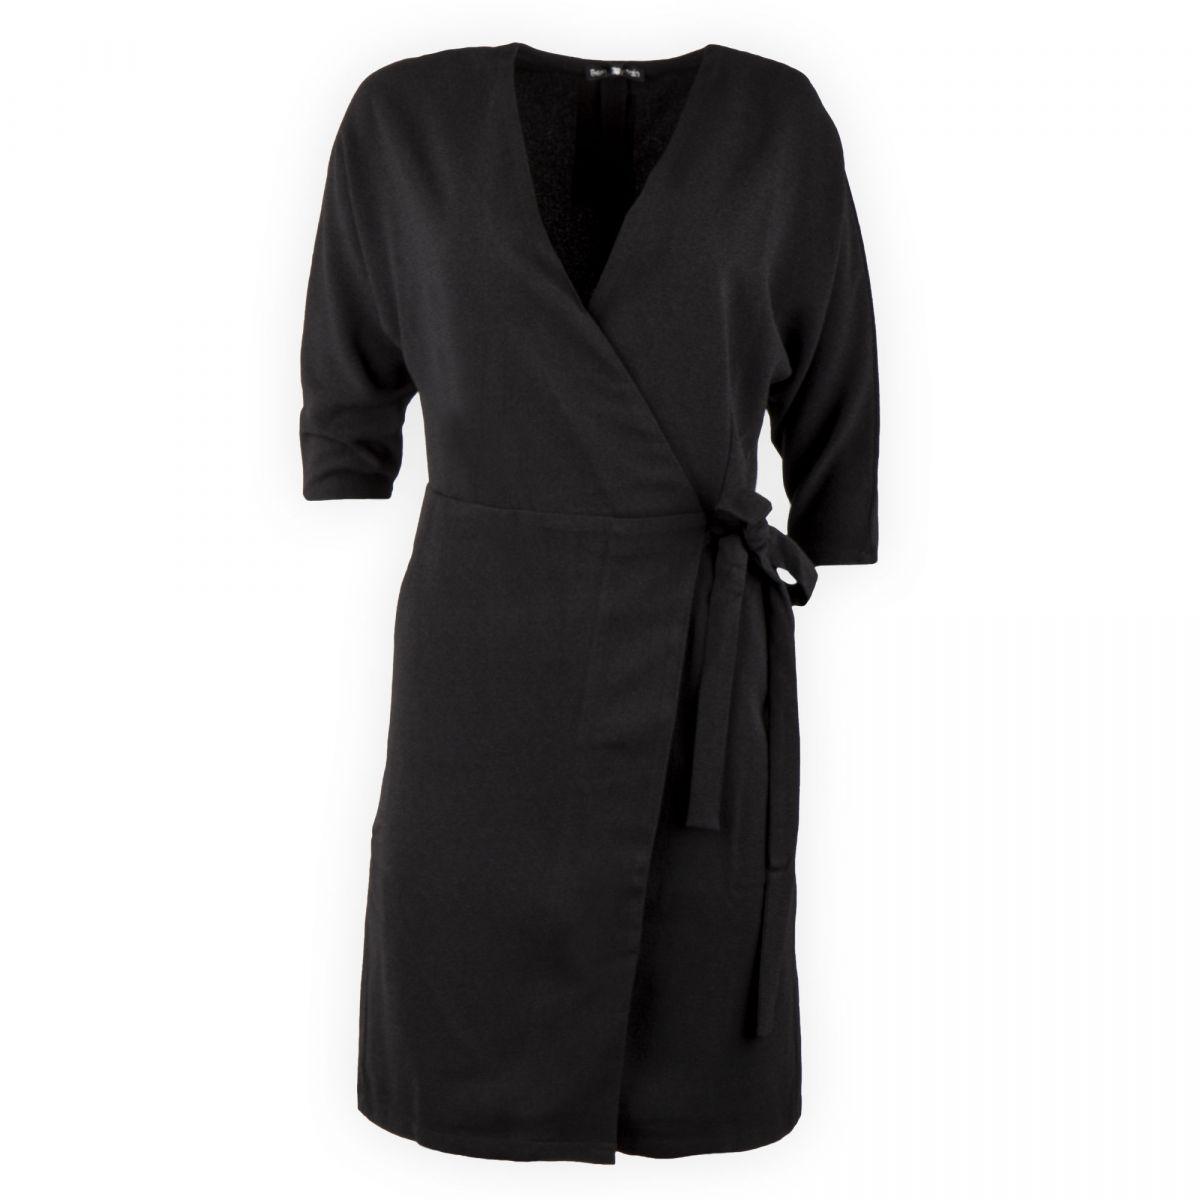 robe portefeuille femme best mountain prix d griff. Black Bedroom Furniture Sets. Home Design Ideas